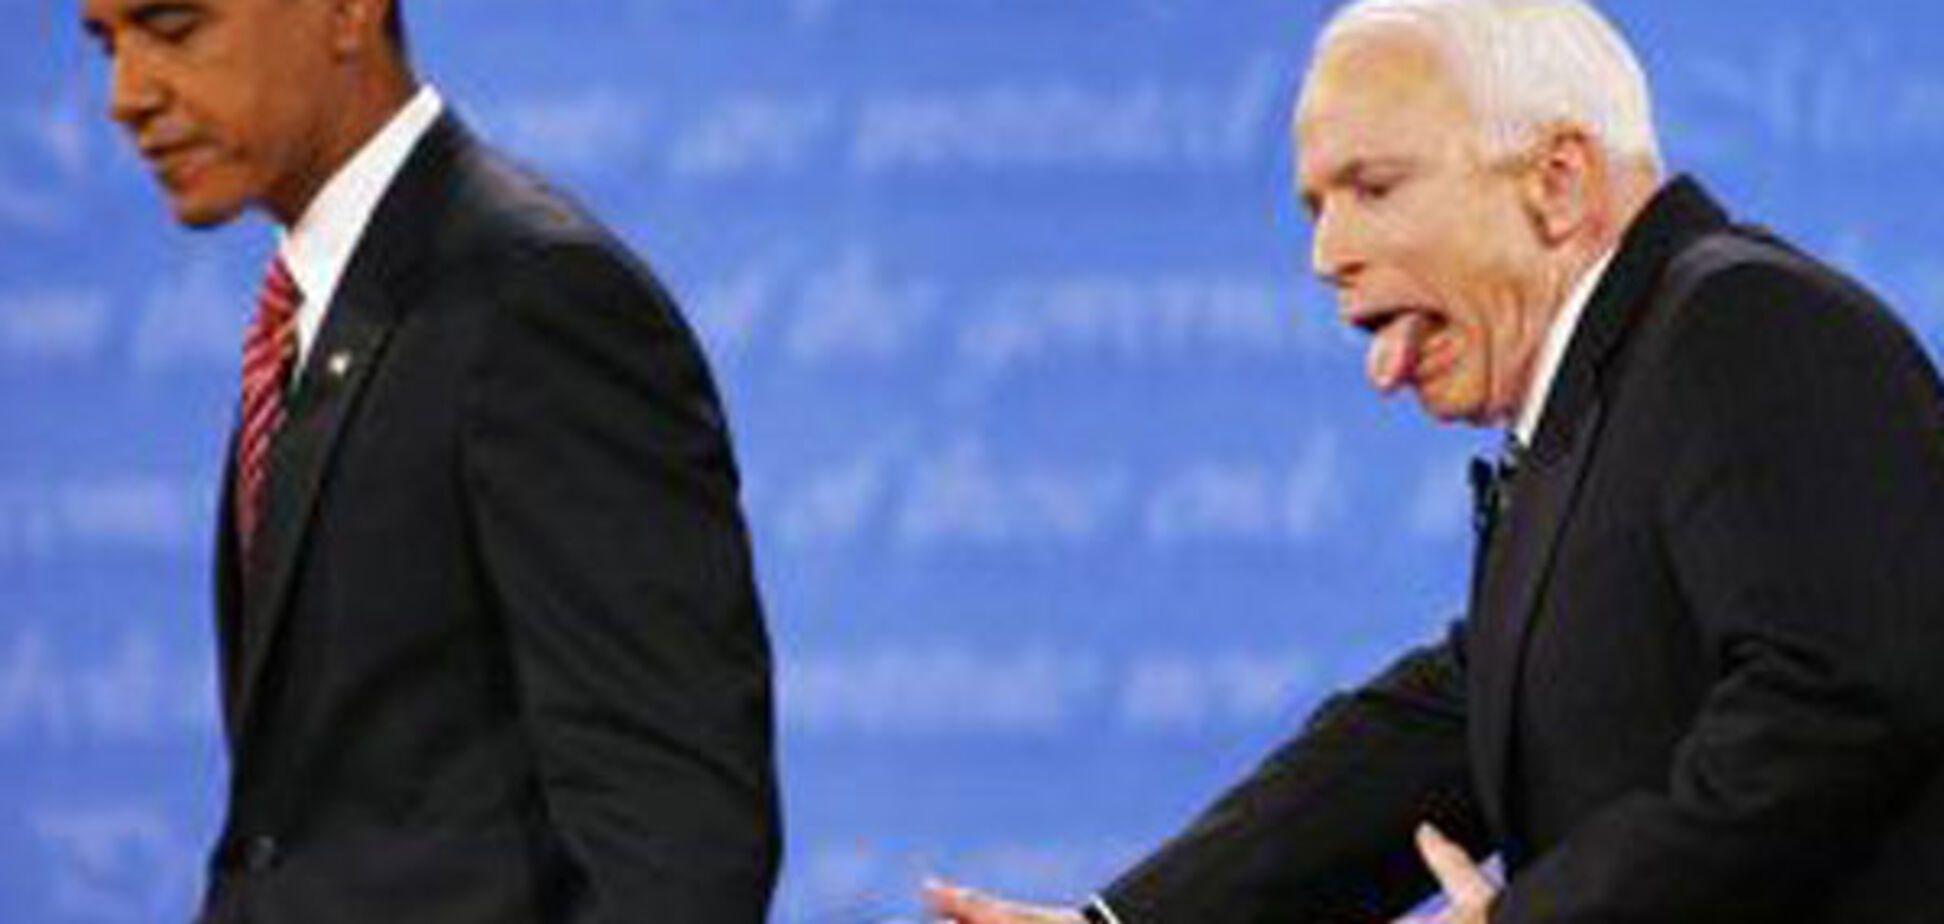 Обама протянул руку аутсайдеру